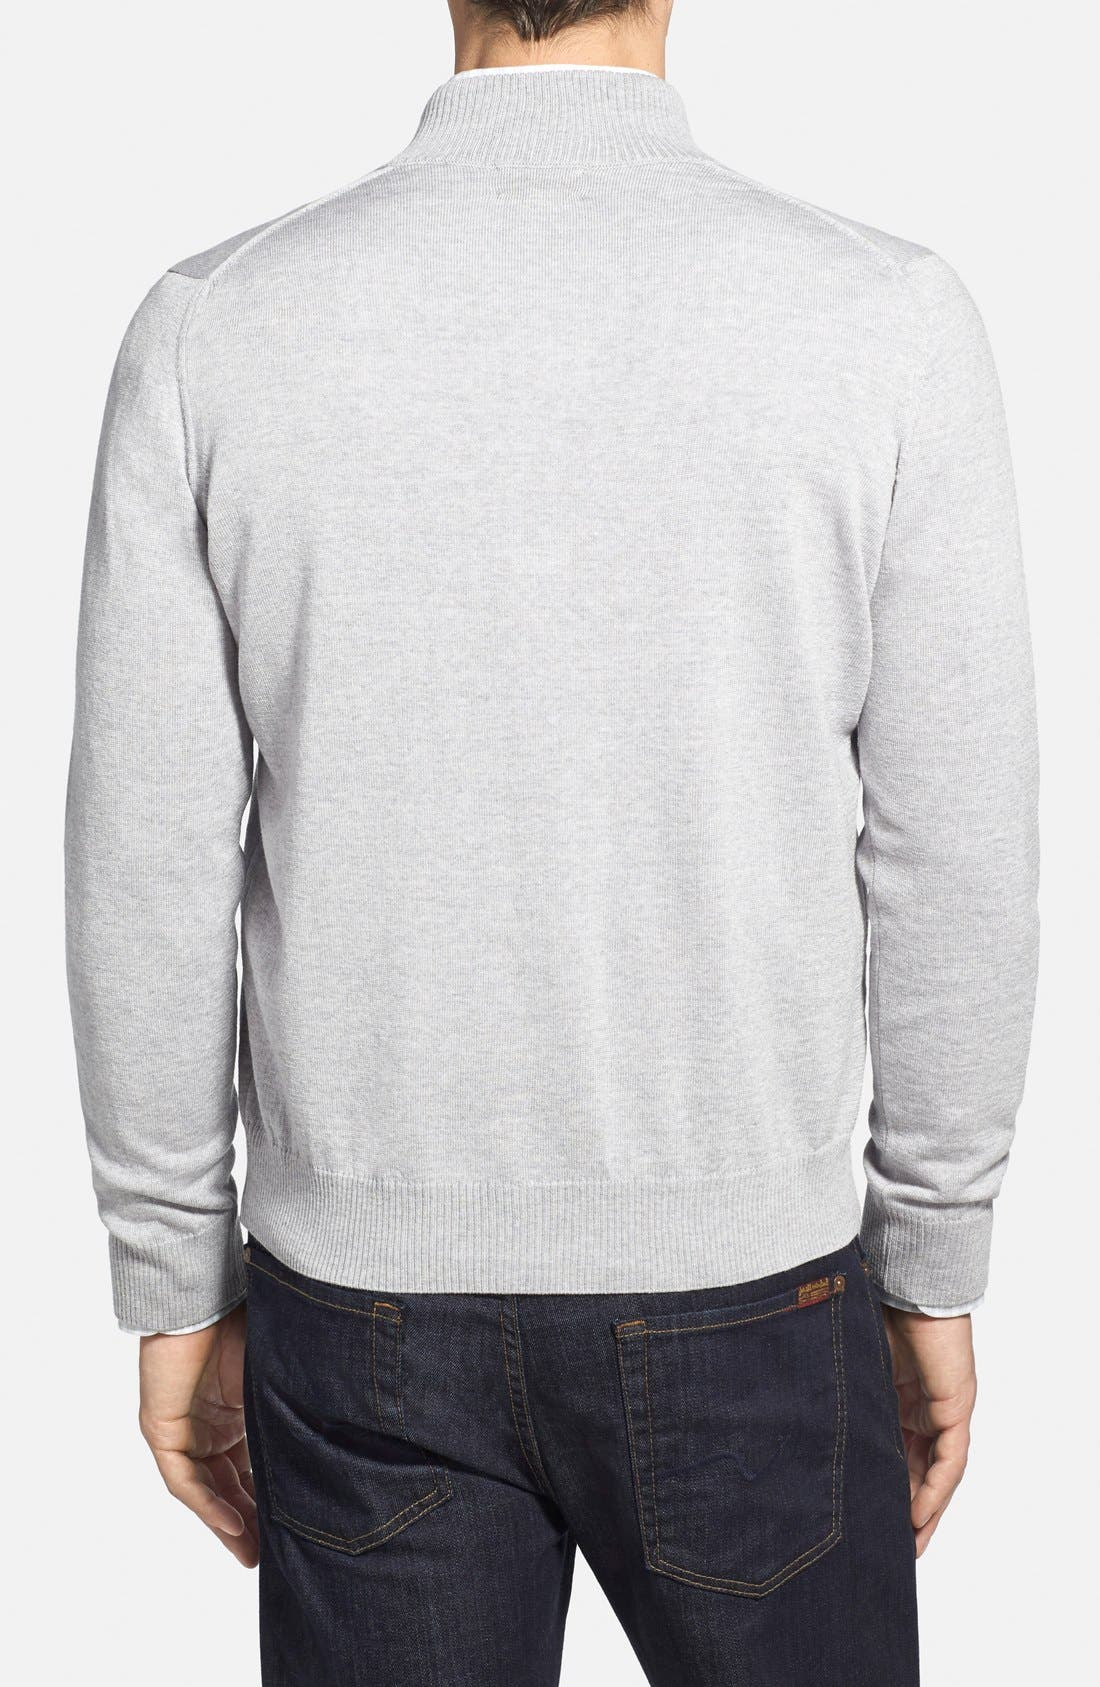 Italian Merino Wool Cardigan Sweater,                             Alternate thumbnail 2, color,                             050